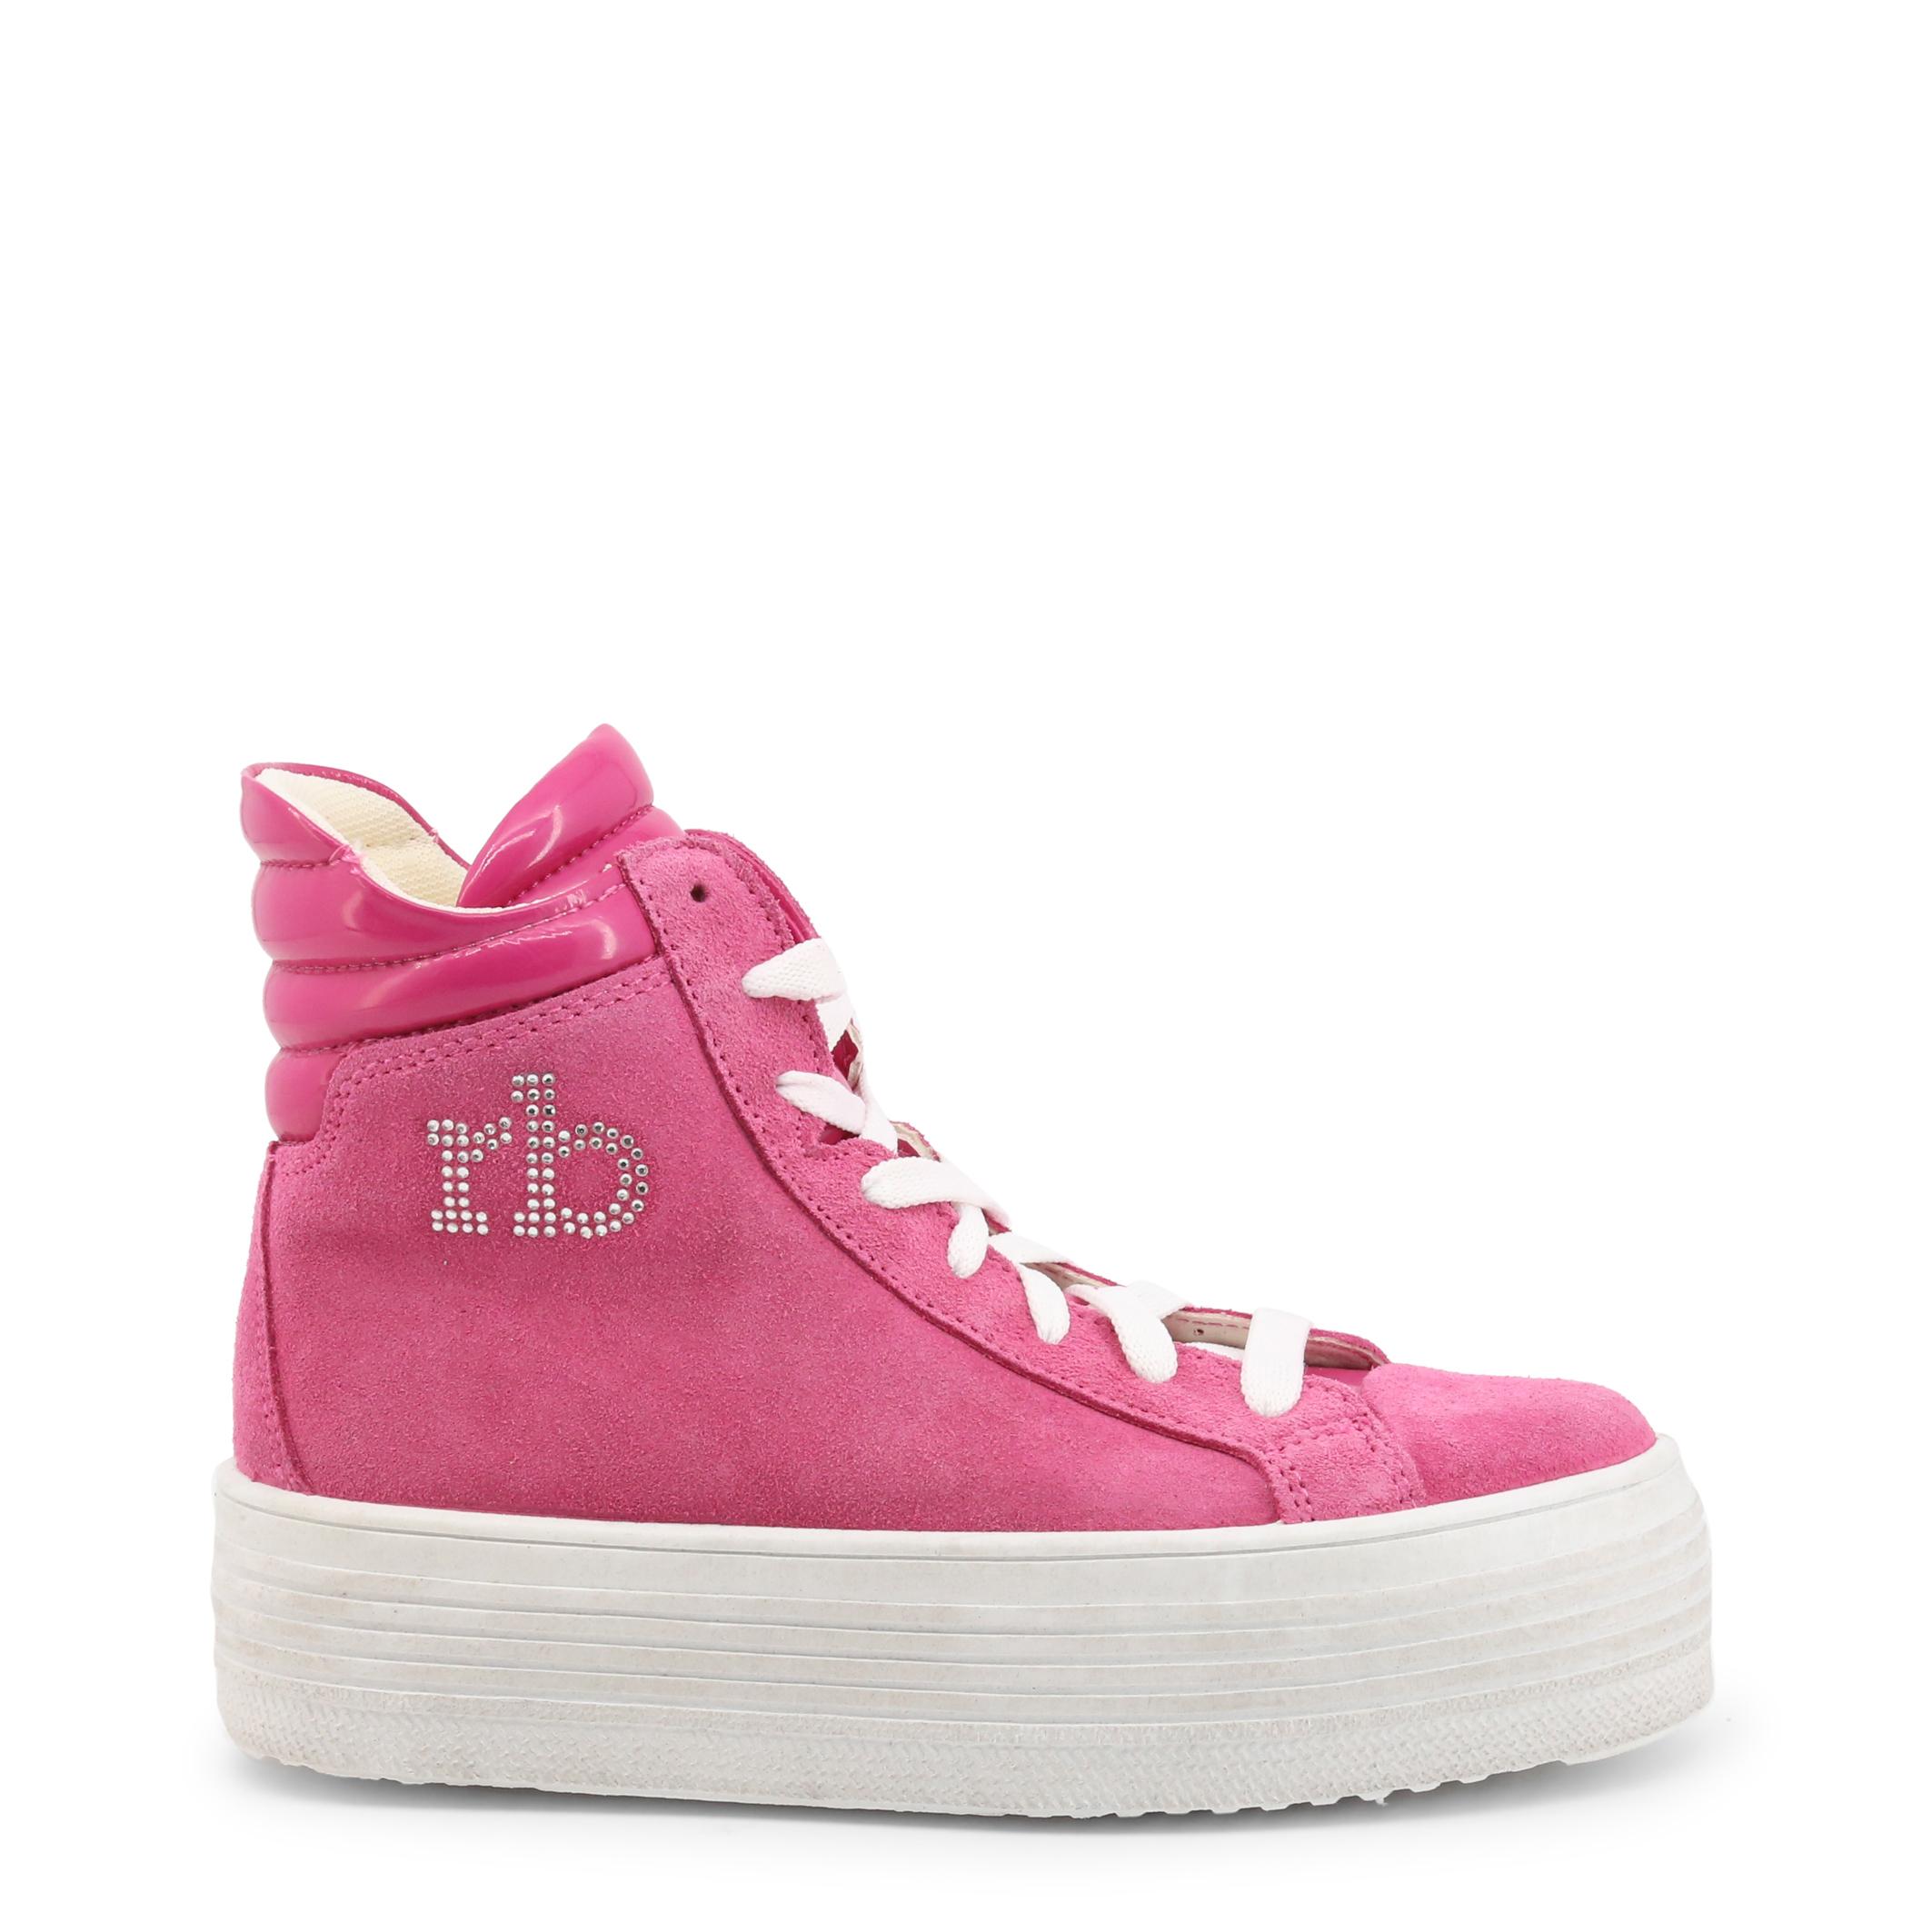 Roccobarocco - RBSC85K01 - Pink